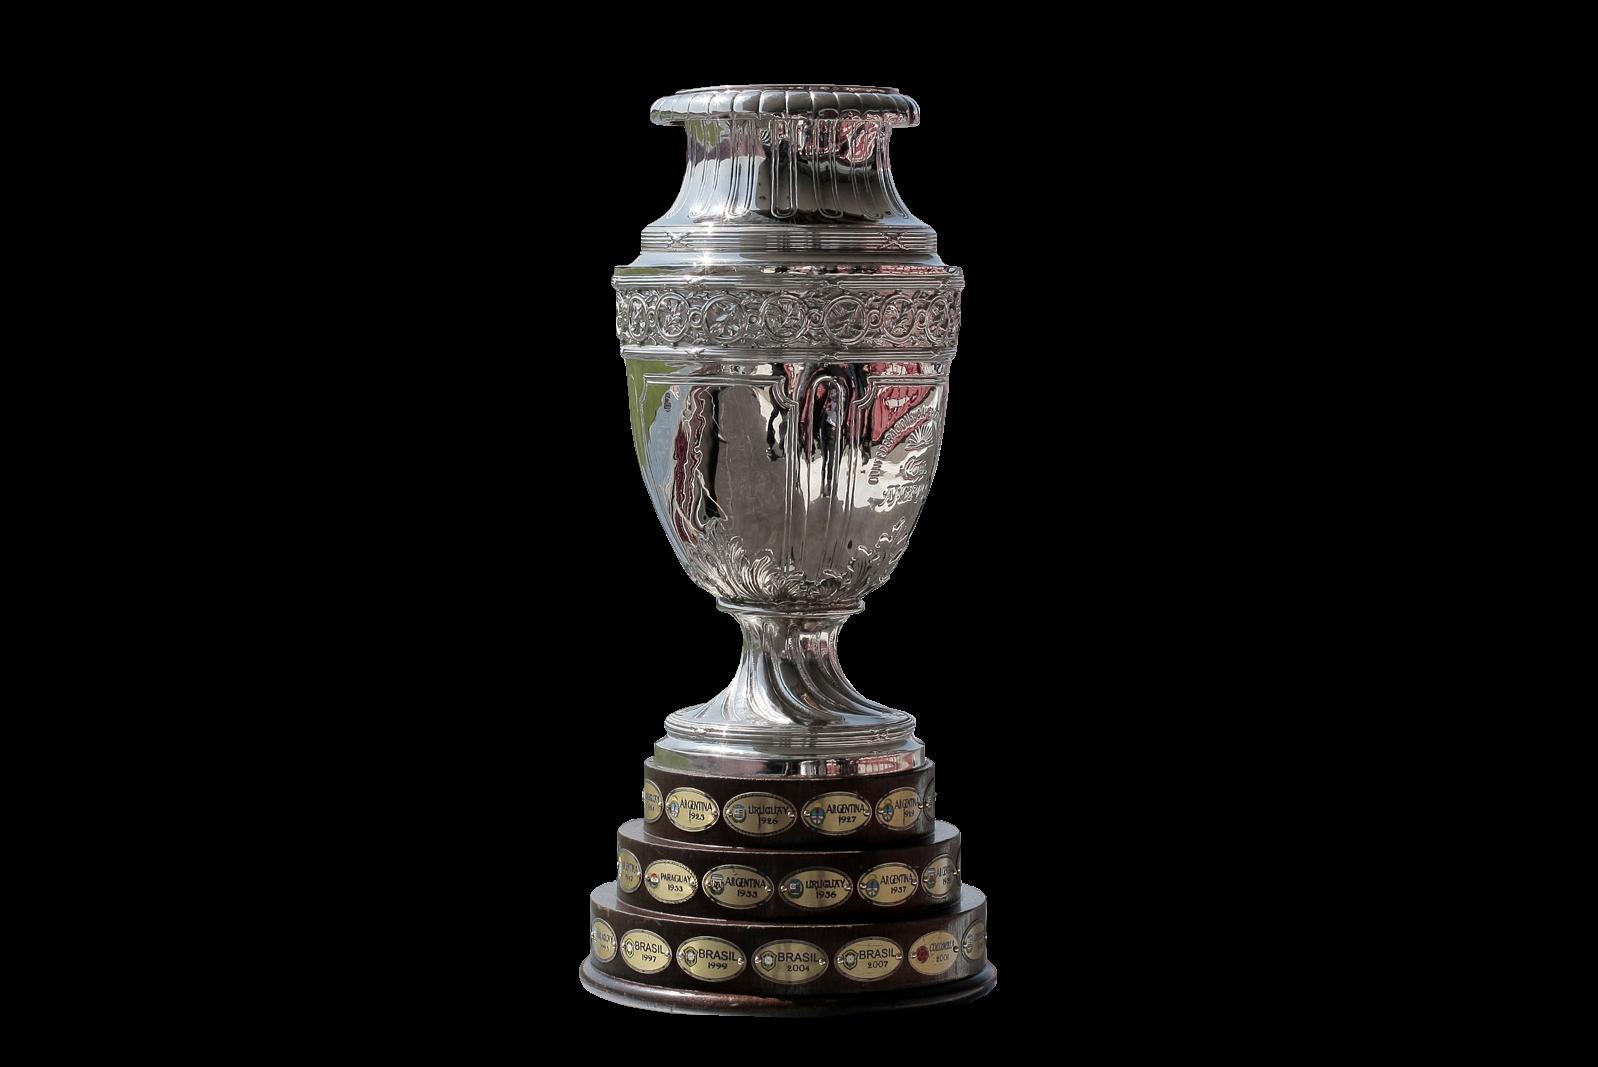 [Imagen: Copa-America-trofeo-sin-fondo.png]